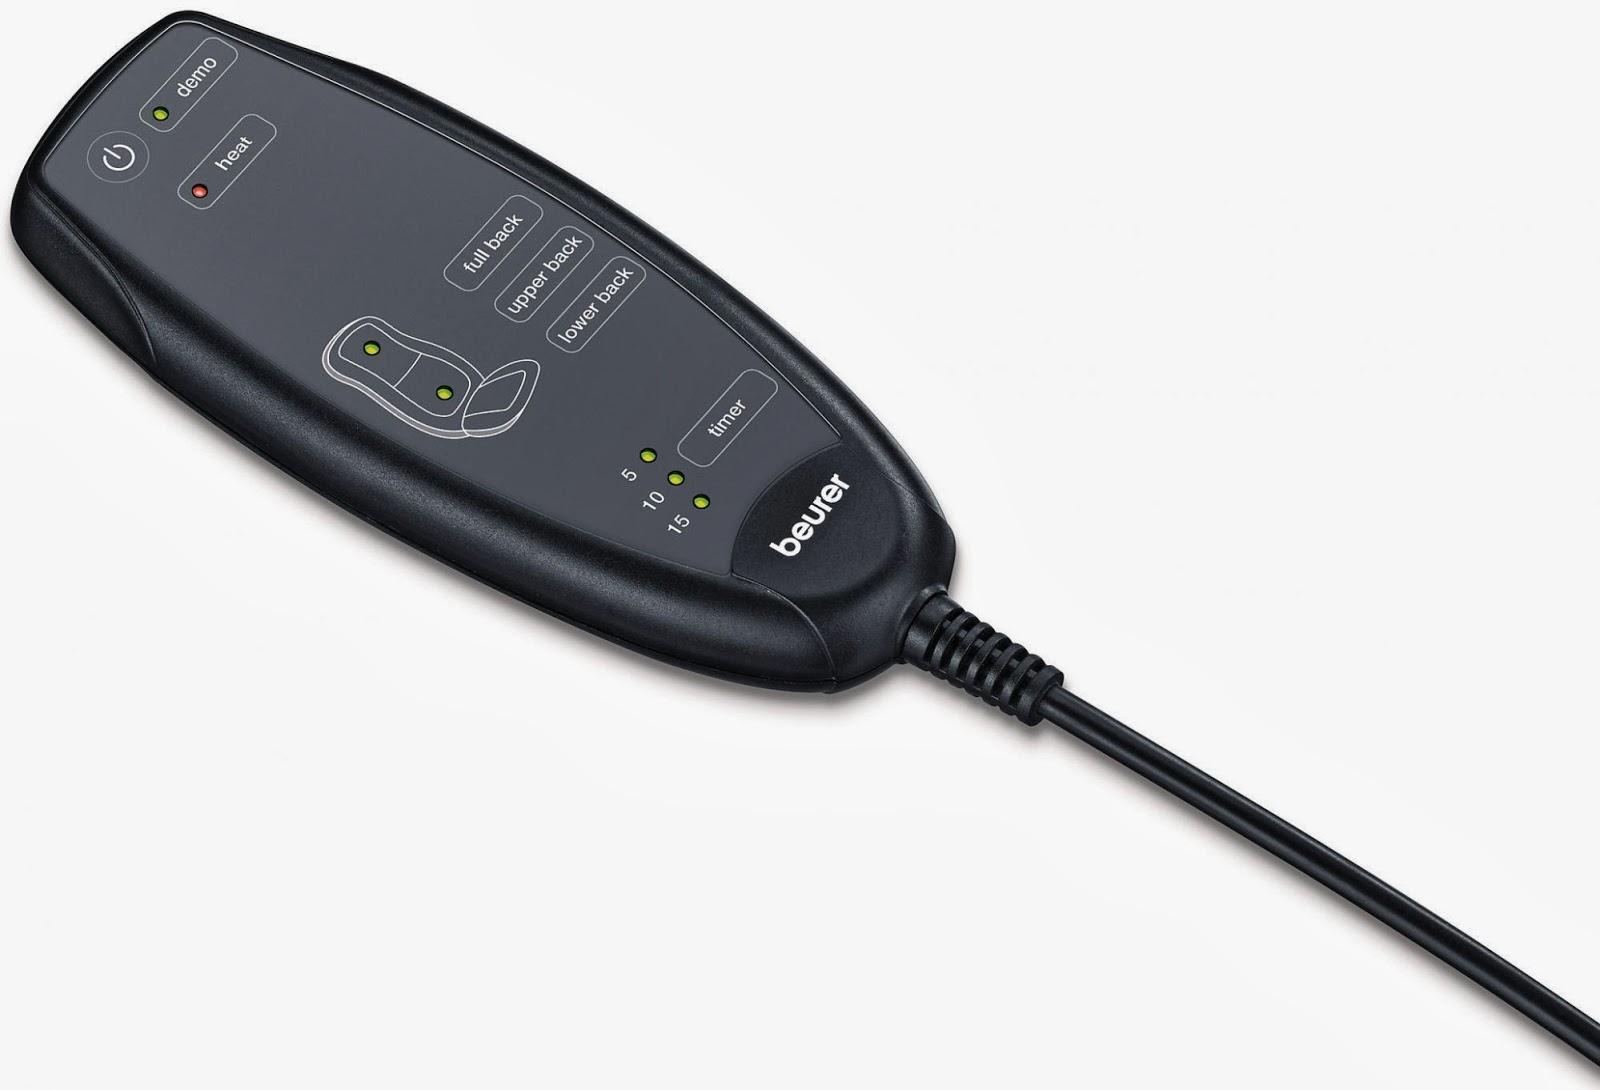 Telecomanda Husa de masaj Beurer MG 204